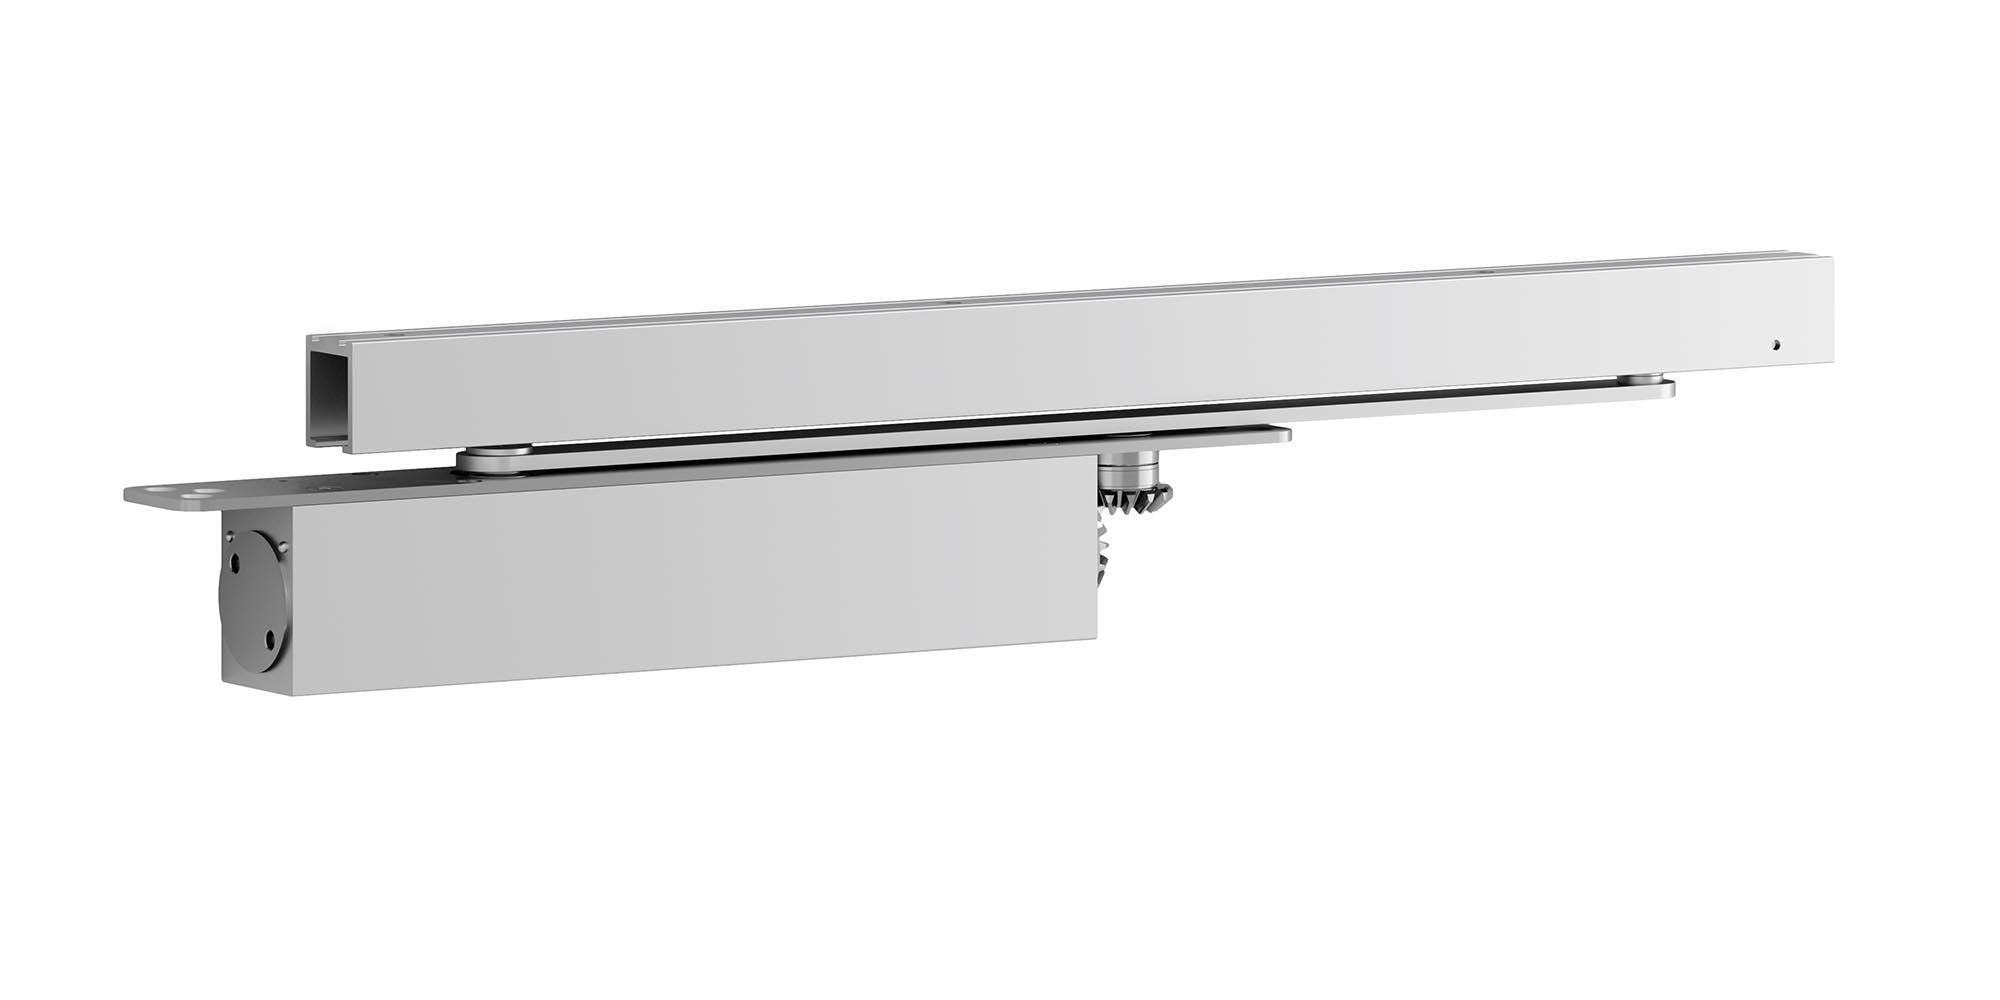 DC860 - Concealed Cam-Motion®